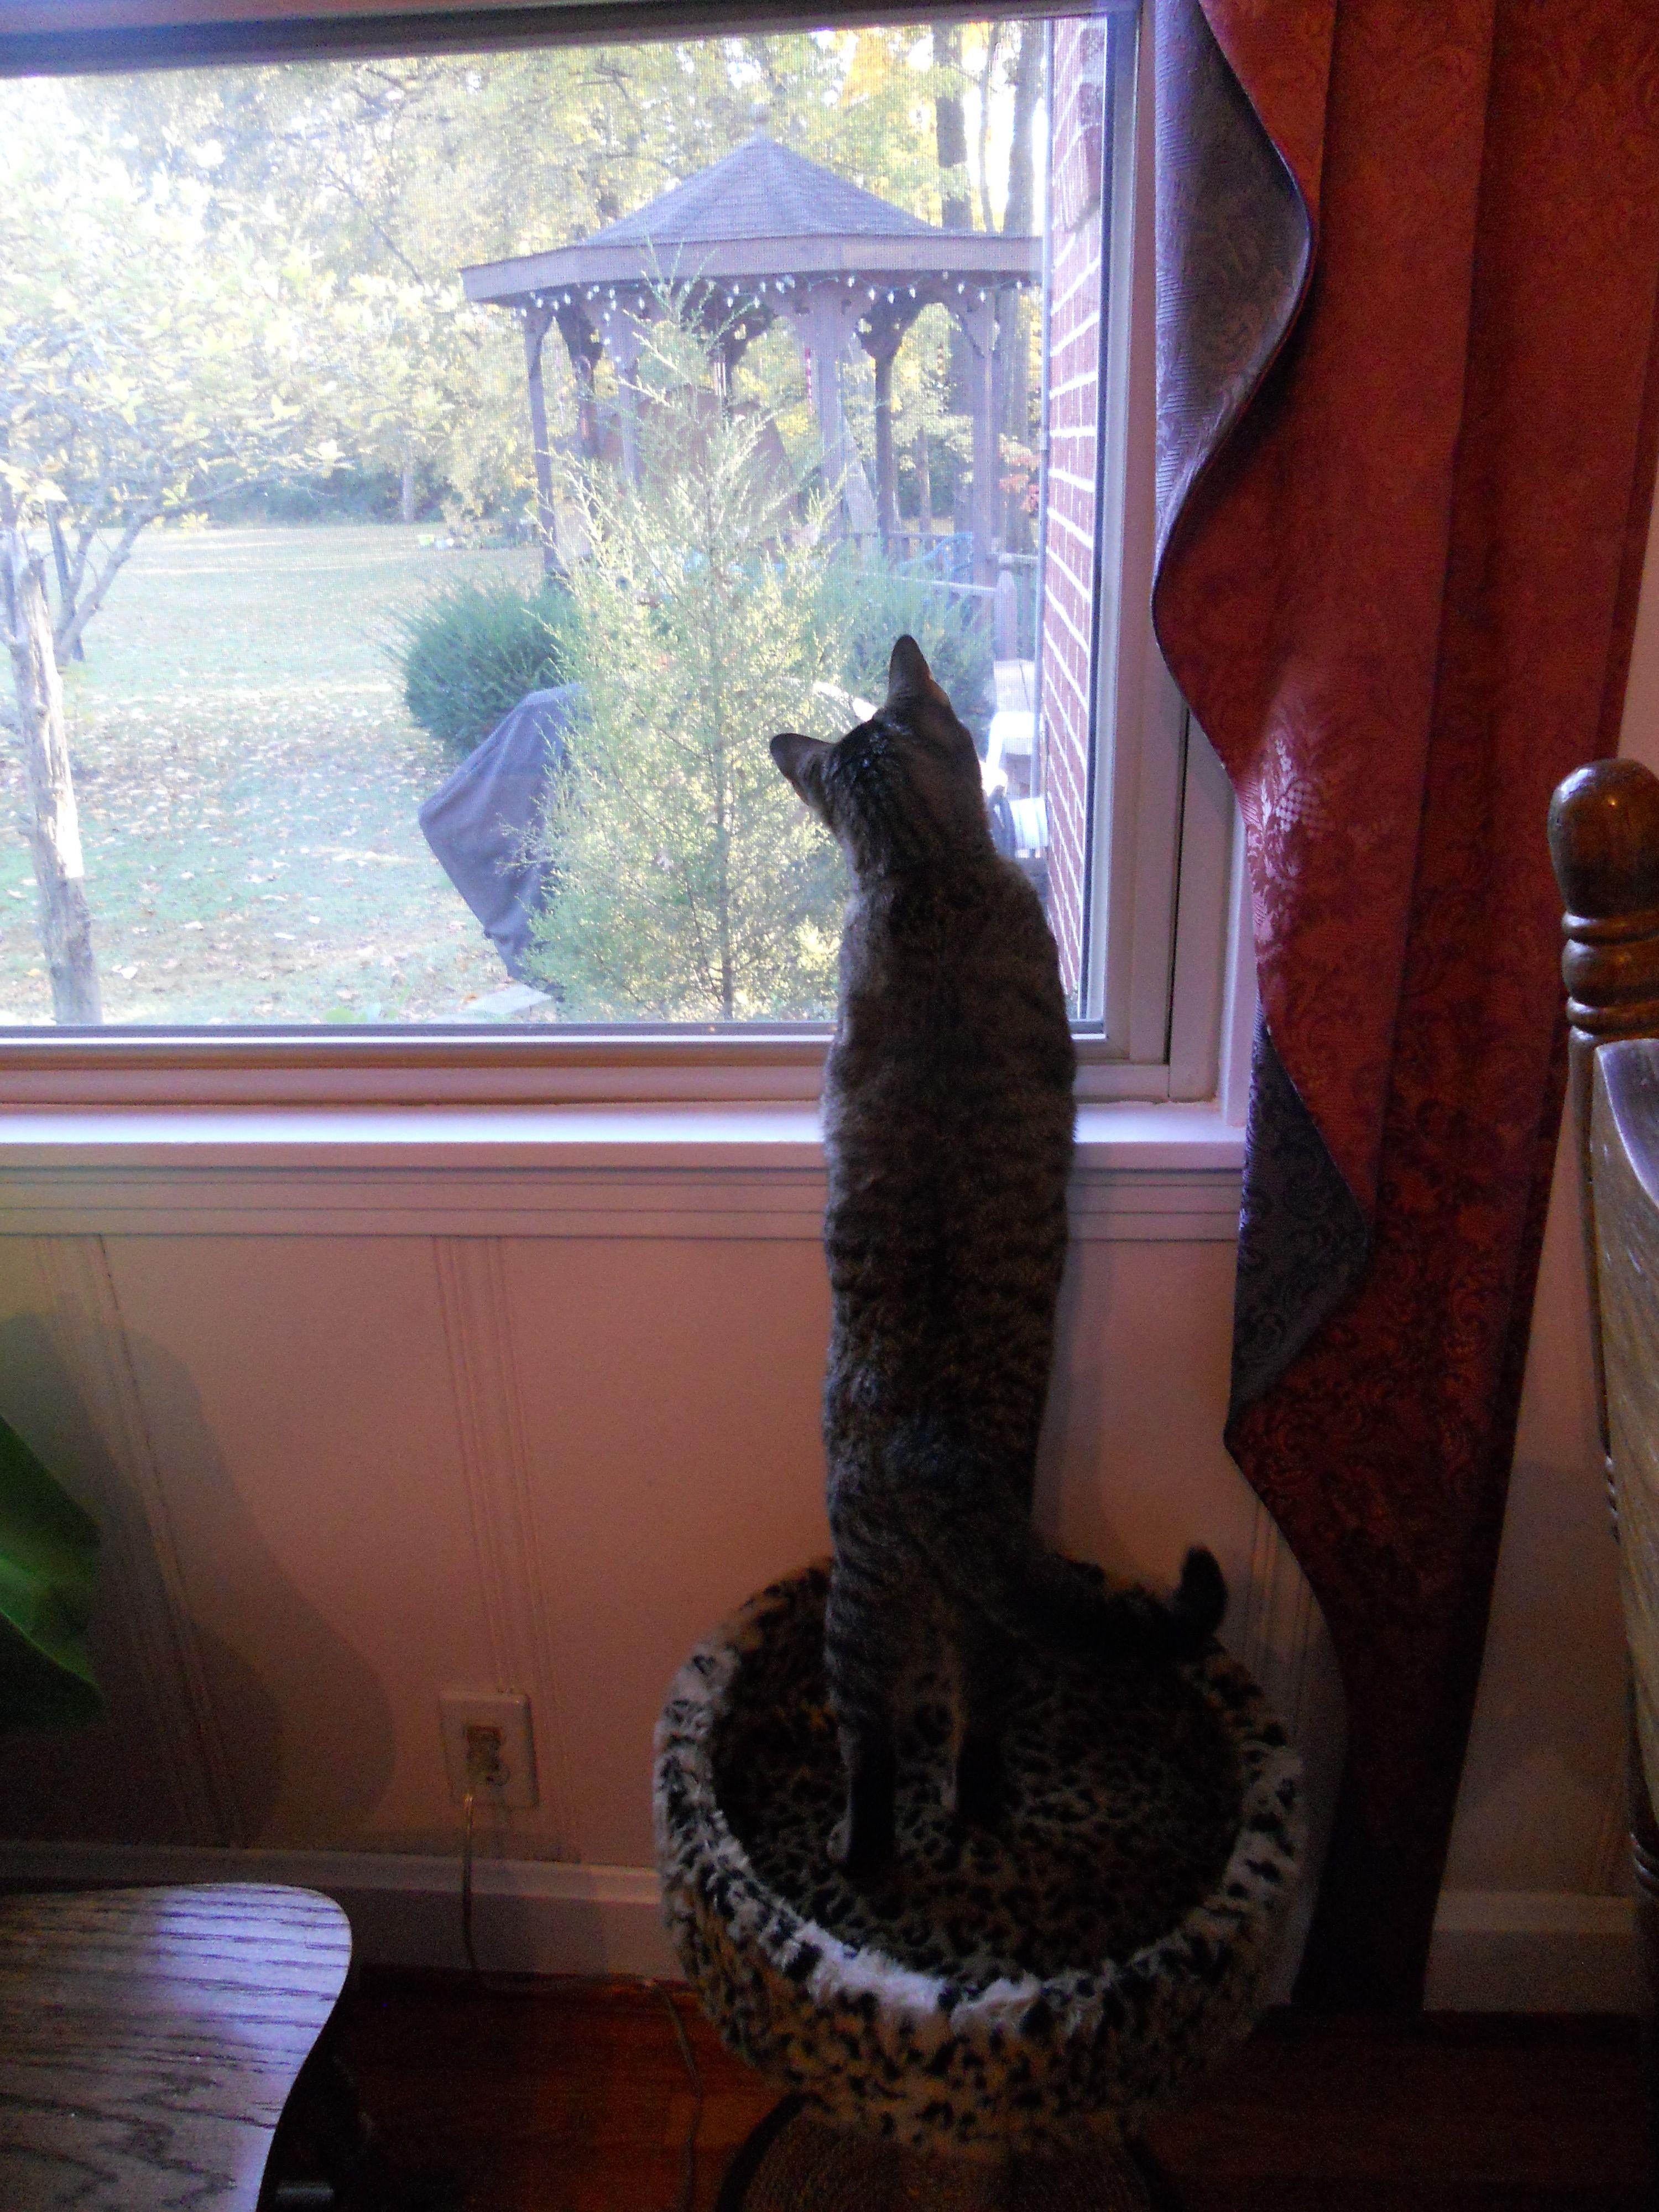 Our daughter moved back home September 2011 bringing her kitten, Violet with her.